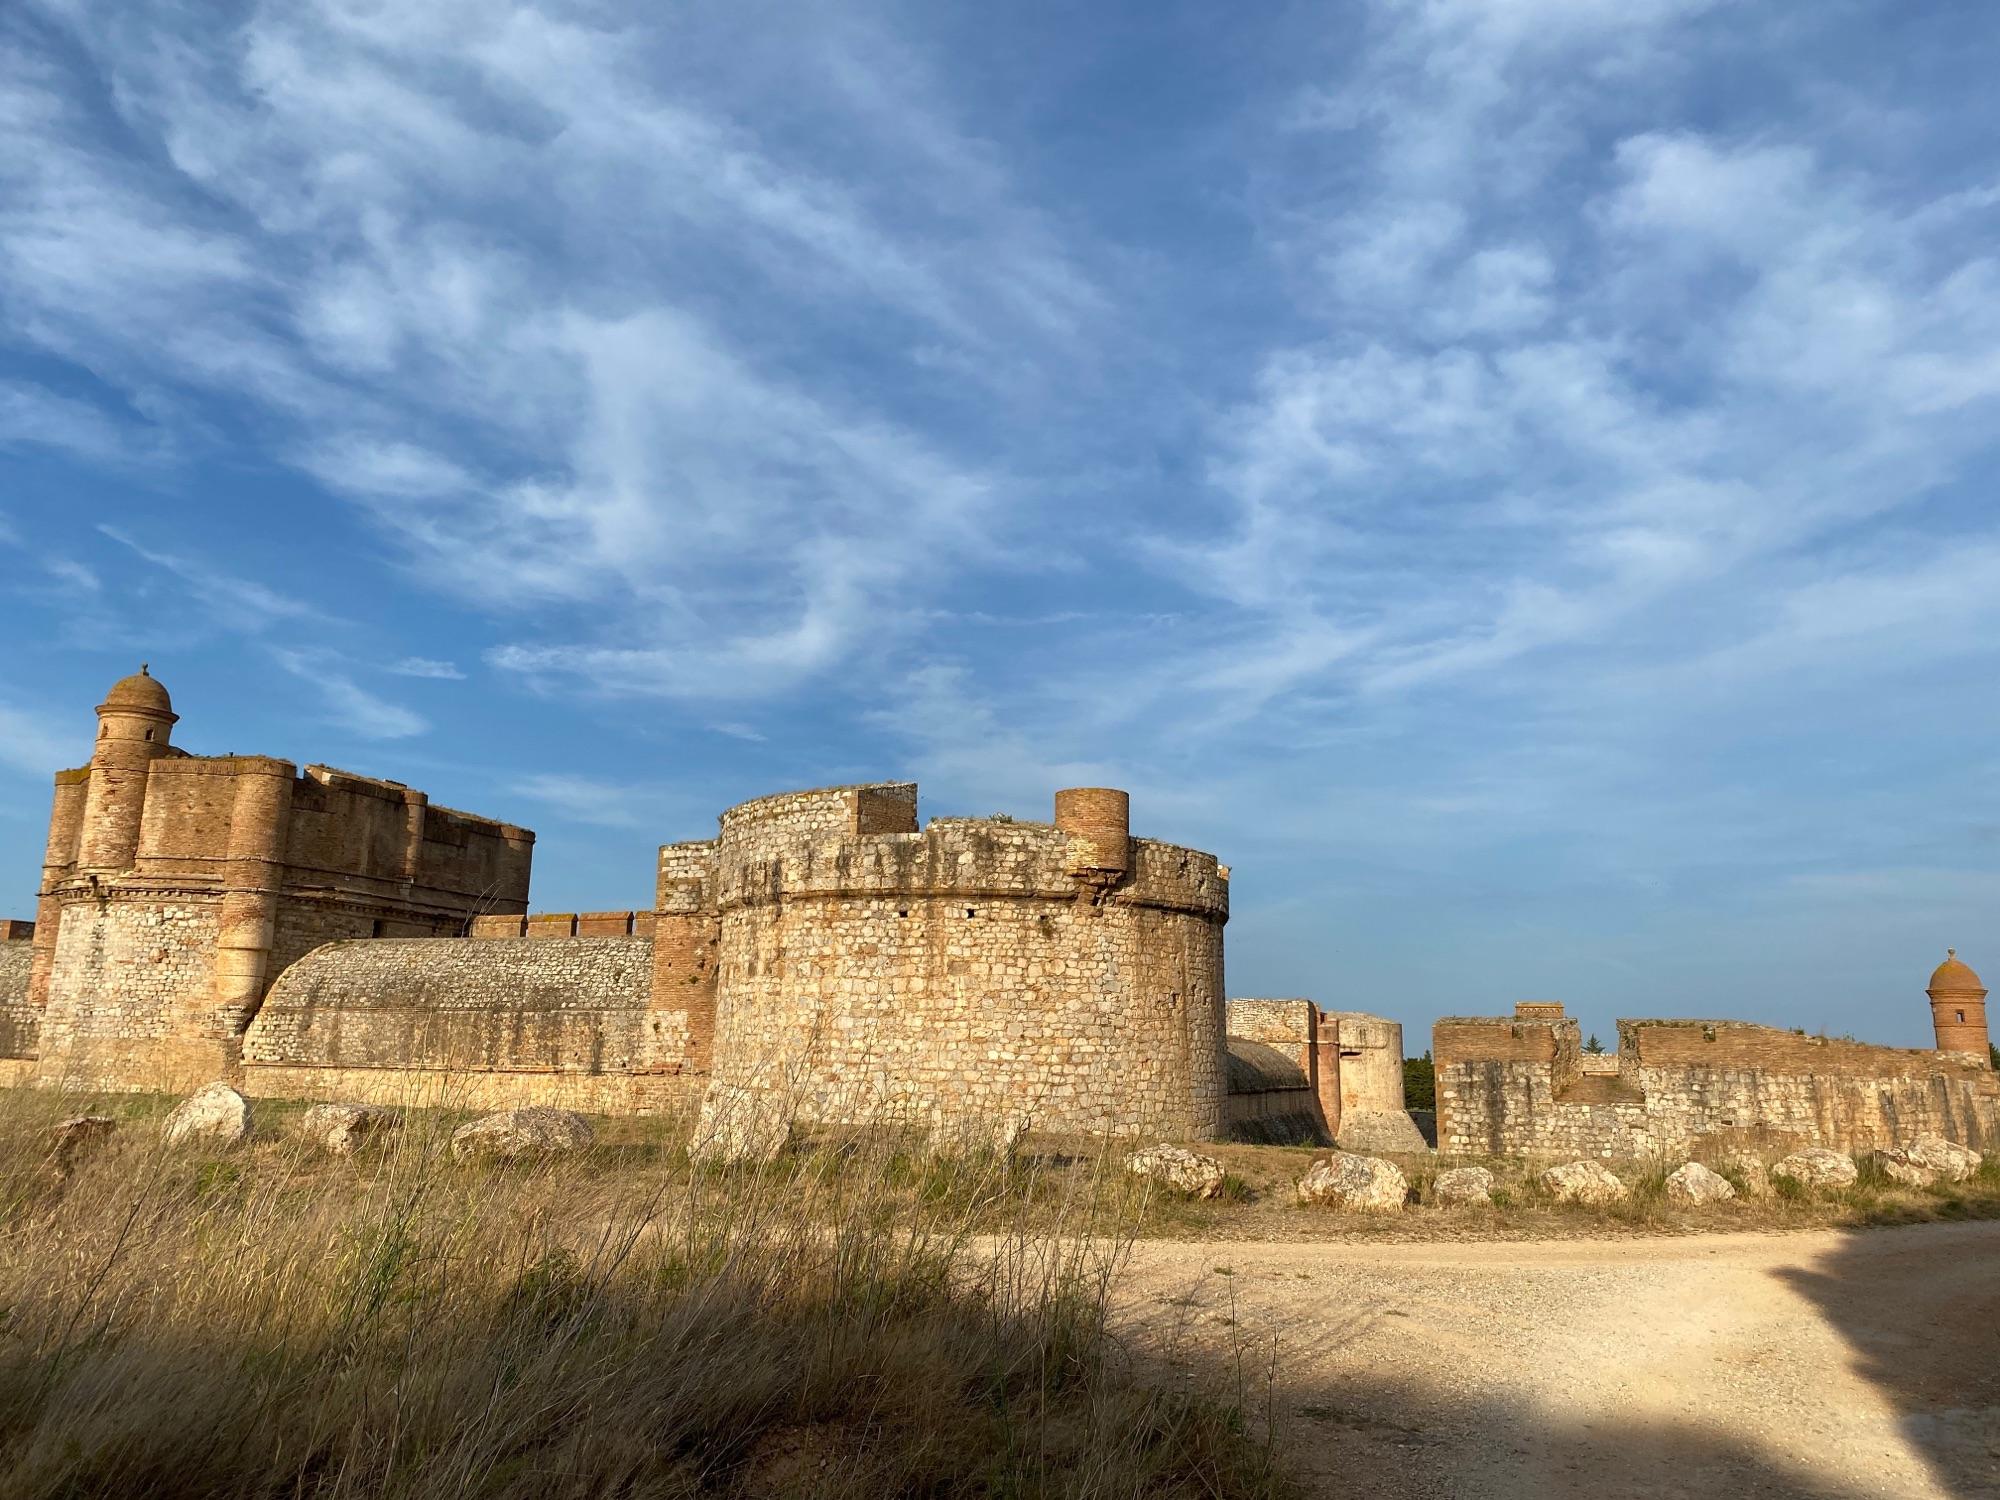 Fortress de Salines